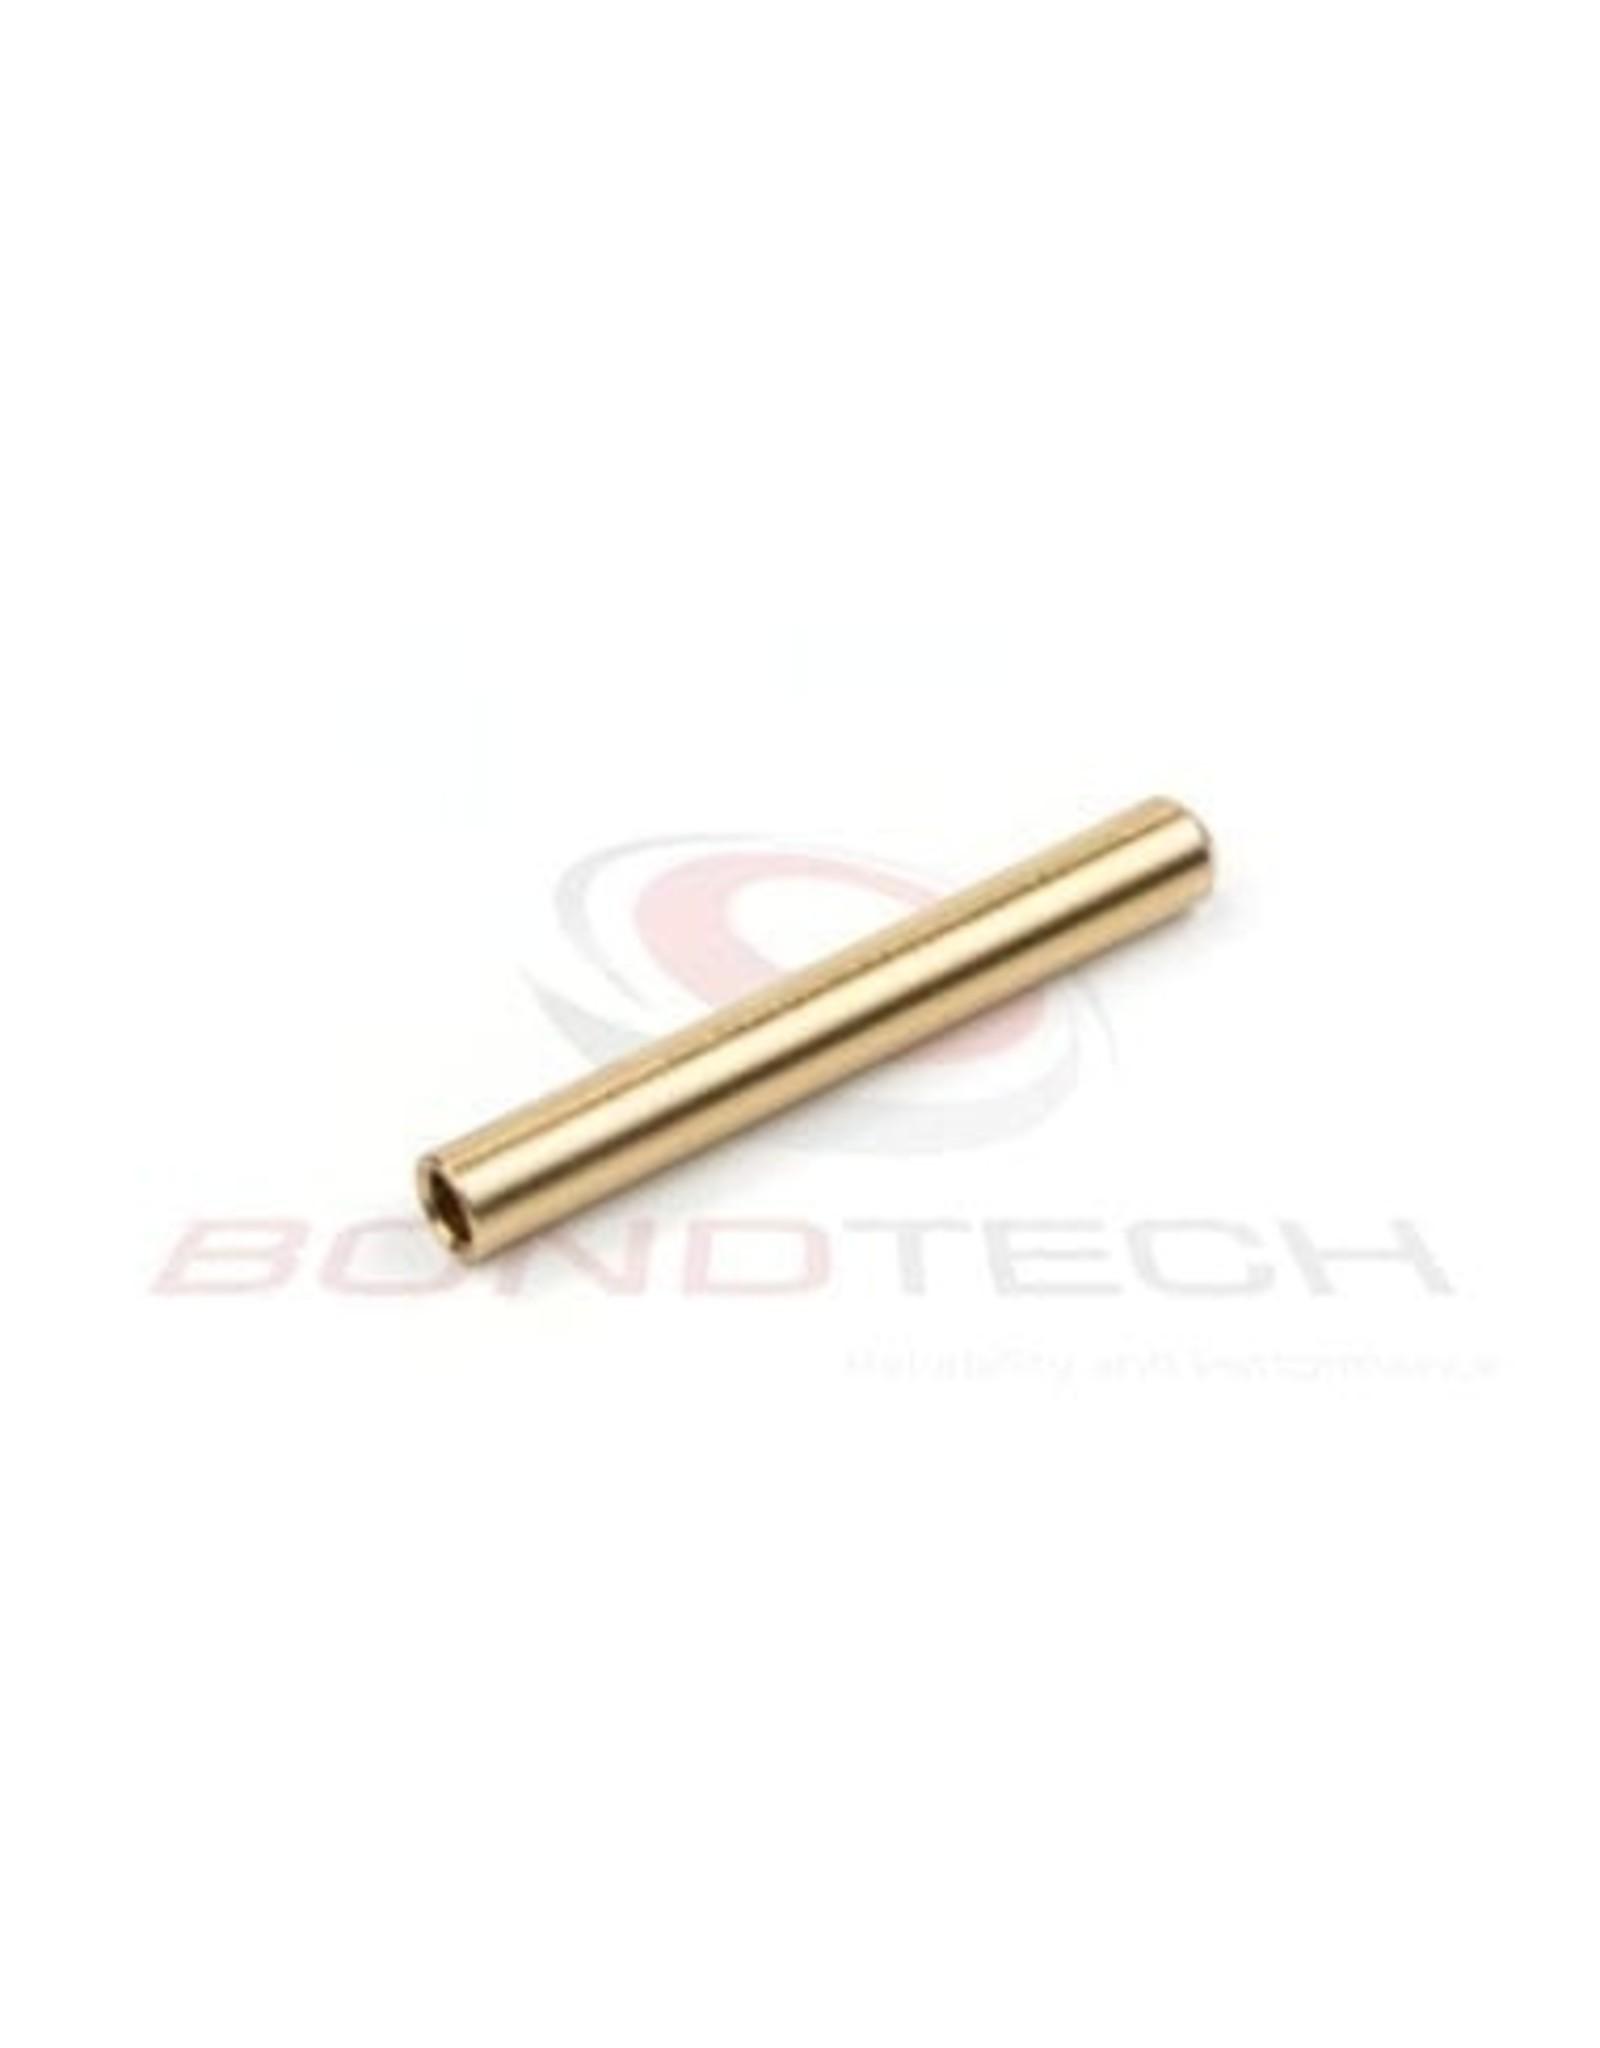 BONDTECH DDX Thermistor Adapter 3.0 mm